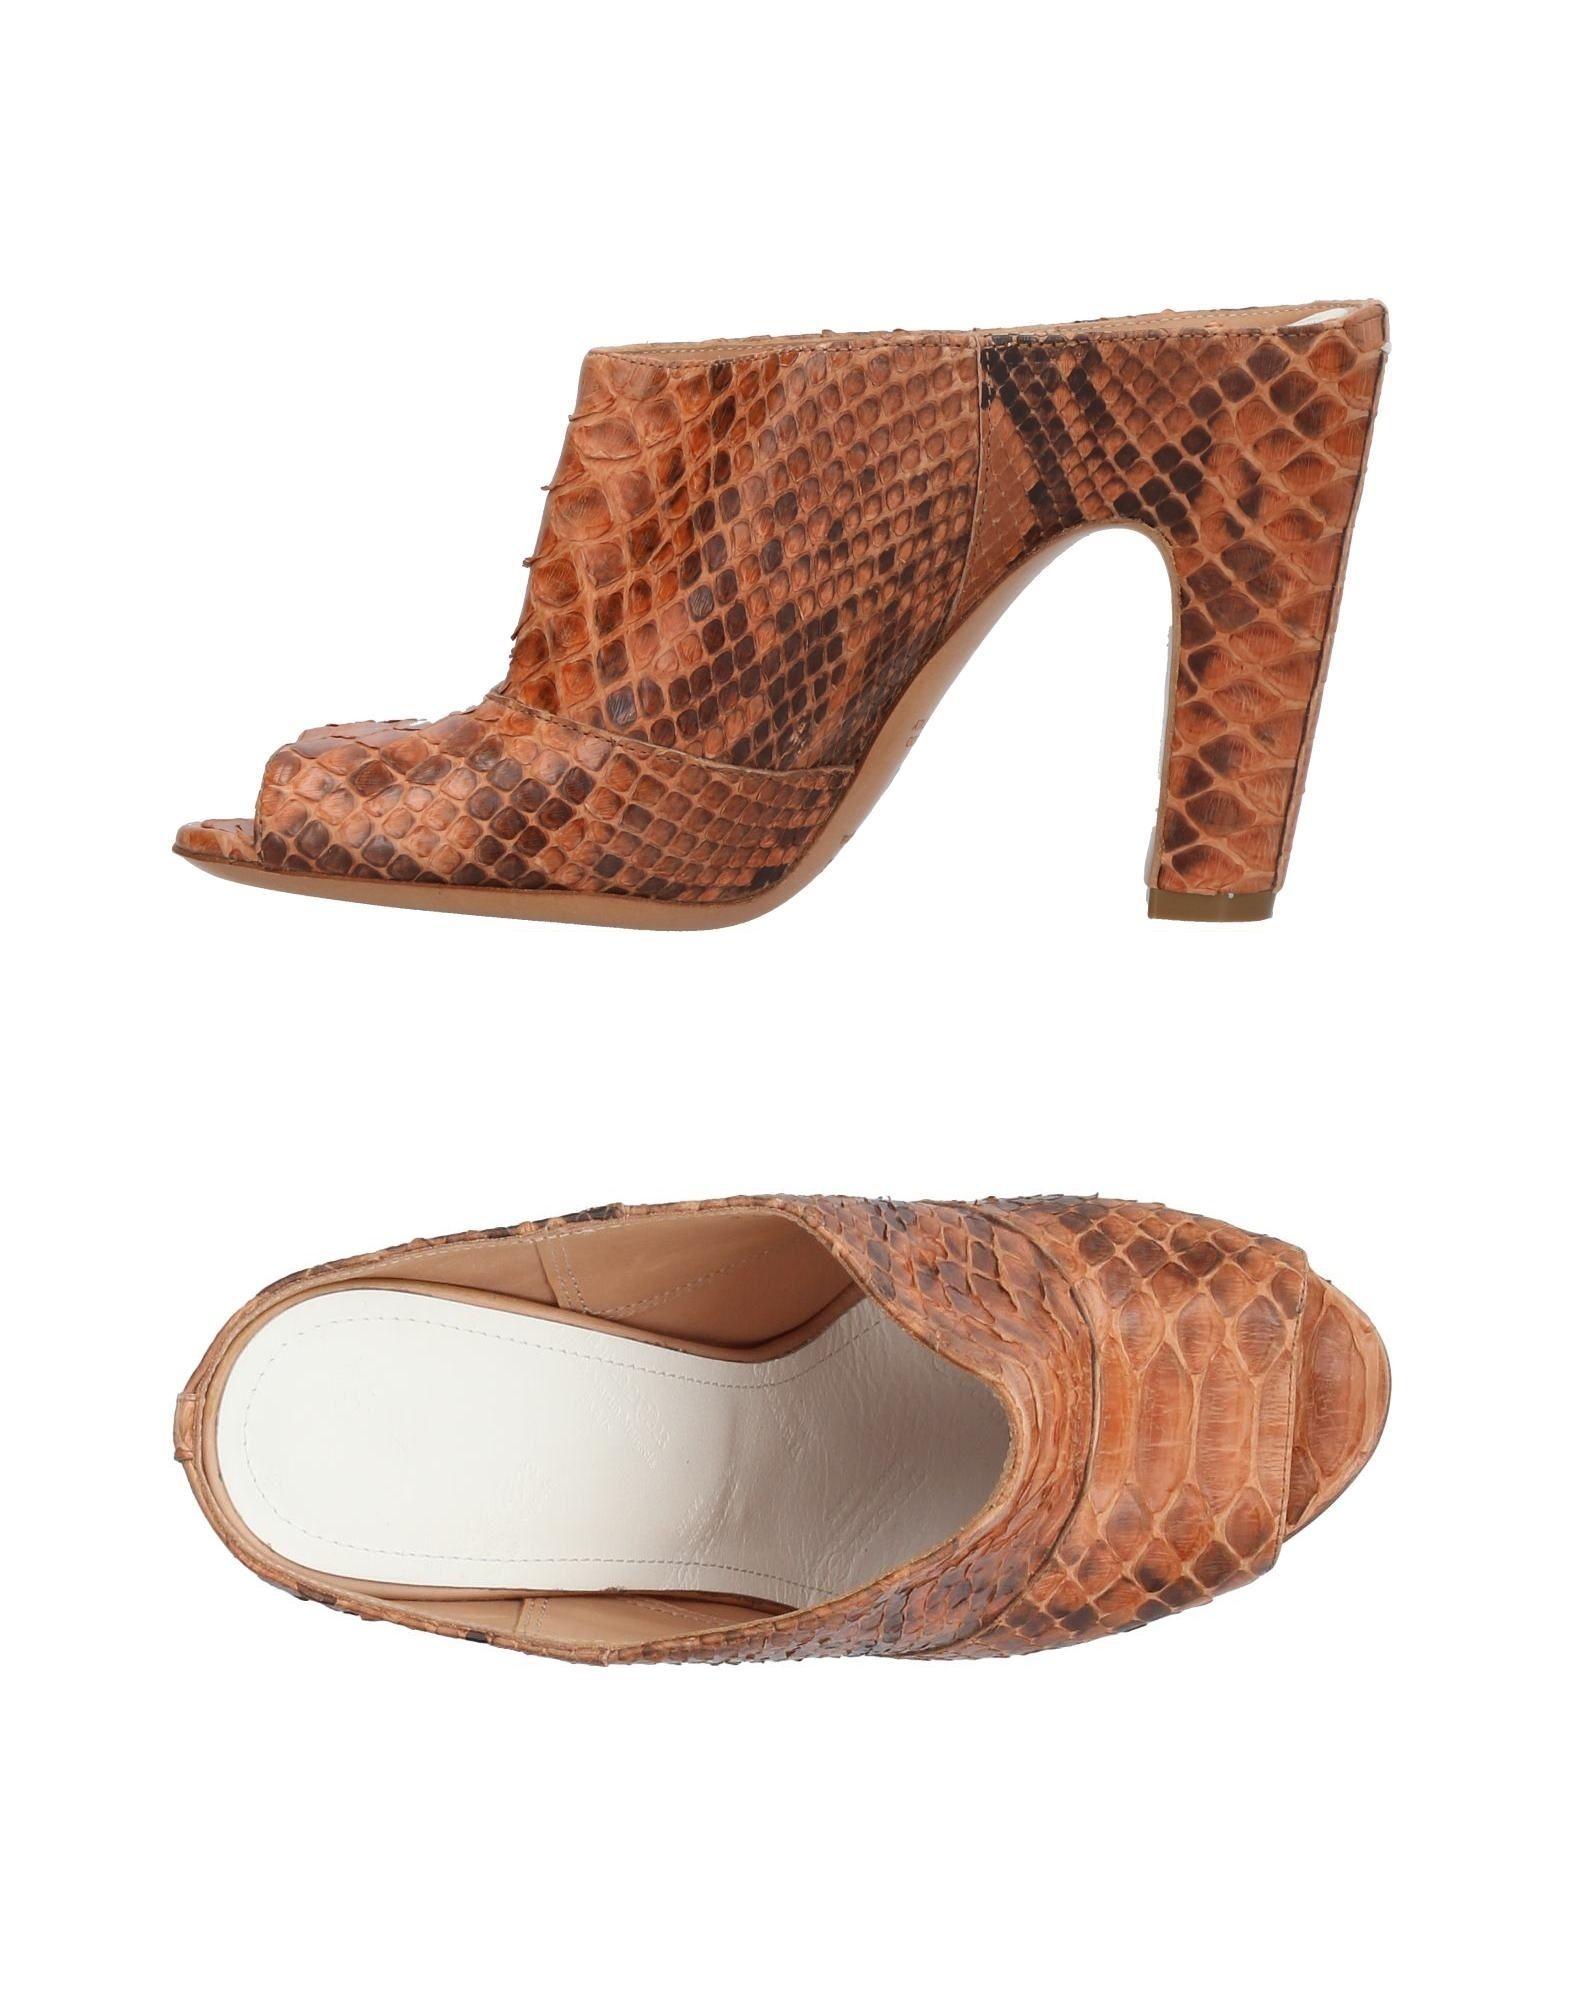 Maison Margiela Sandalen Damen  11403406VWGünstige gut aussehende Schuhe